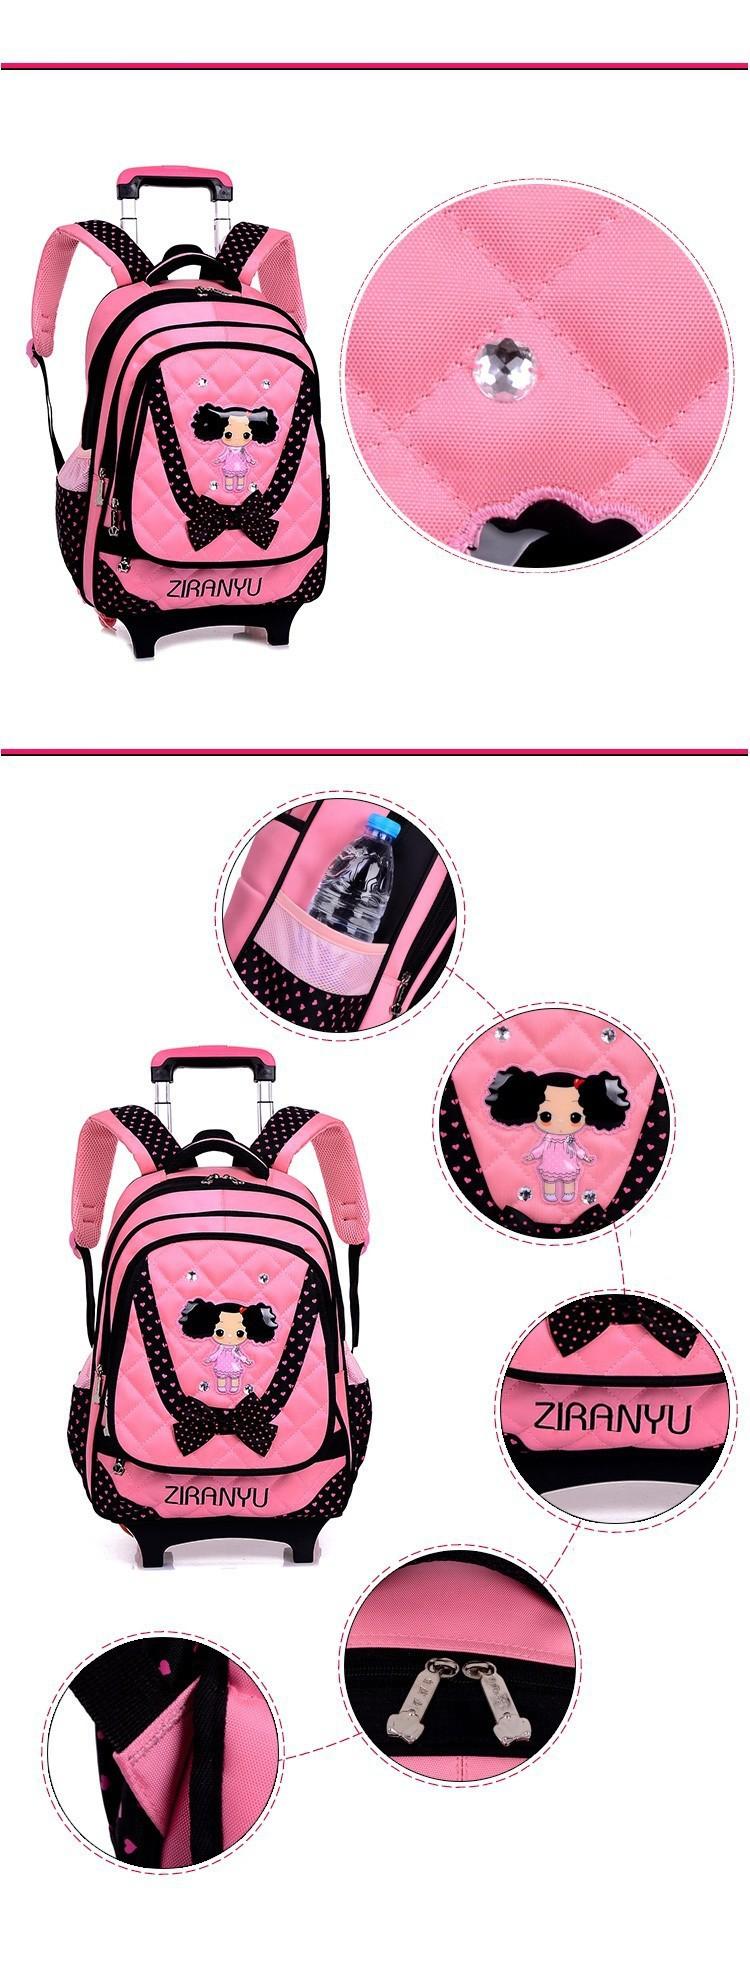 kids-wheeled-school-backpack-children-school-trolley-backpack-carton-pattern-rolling-luggage-kids-detachable-and-orthopedic-2